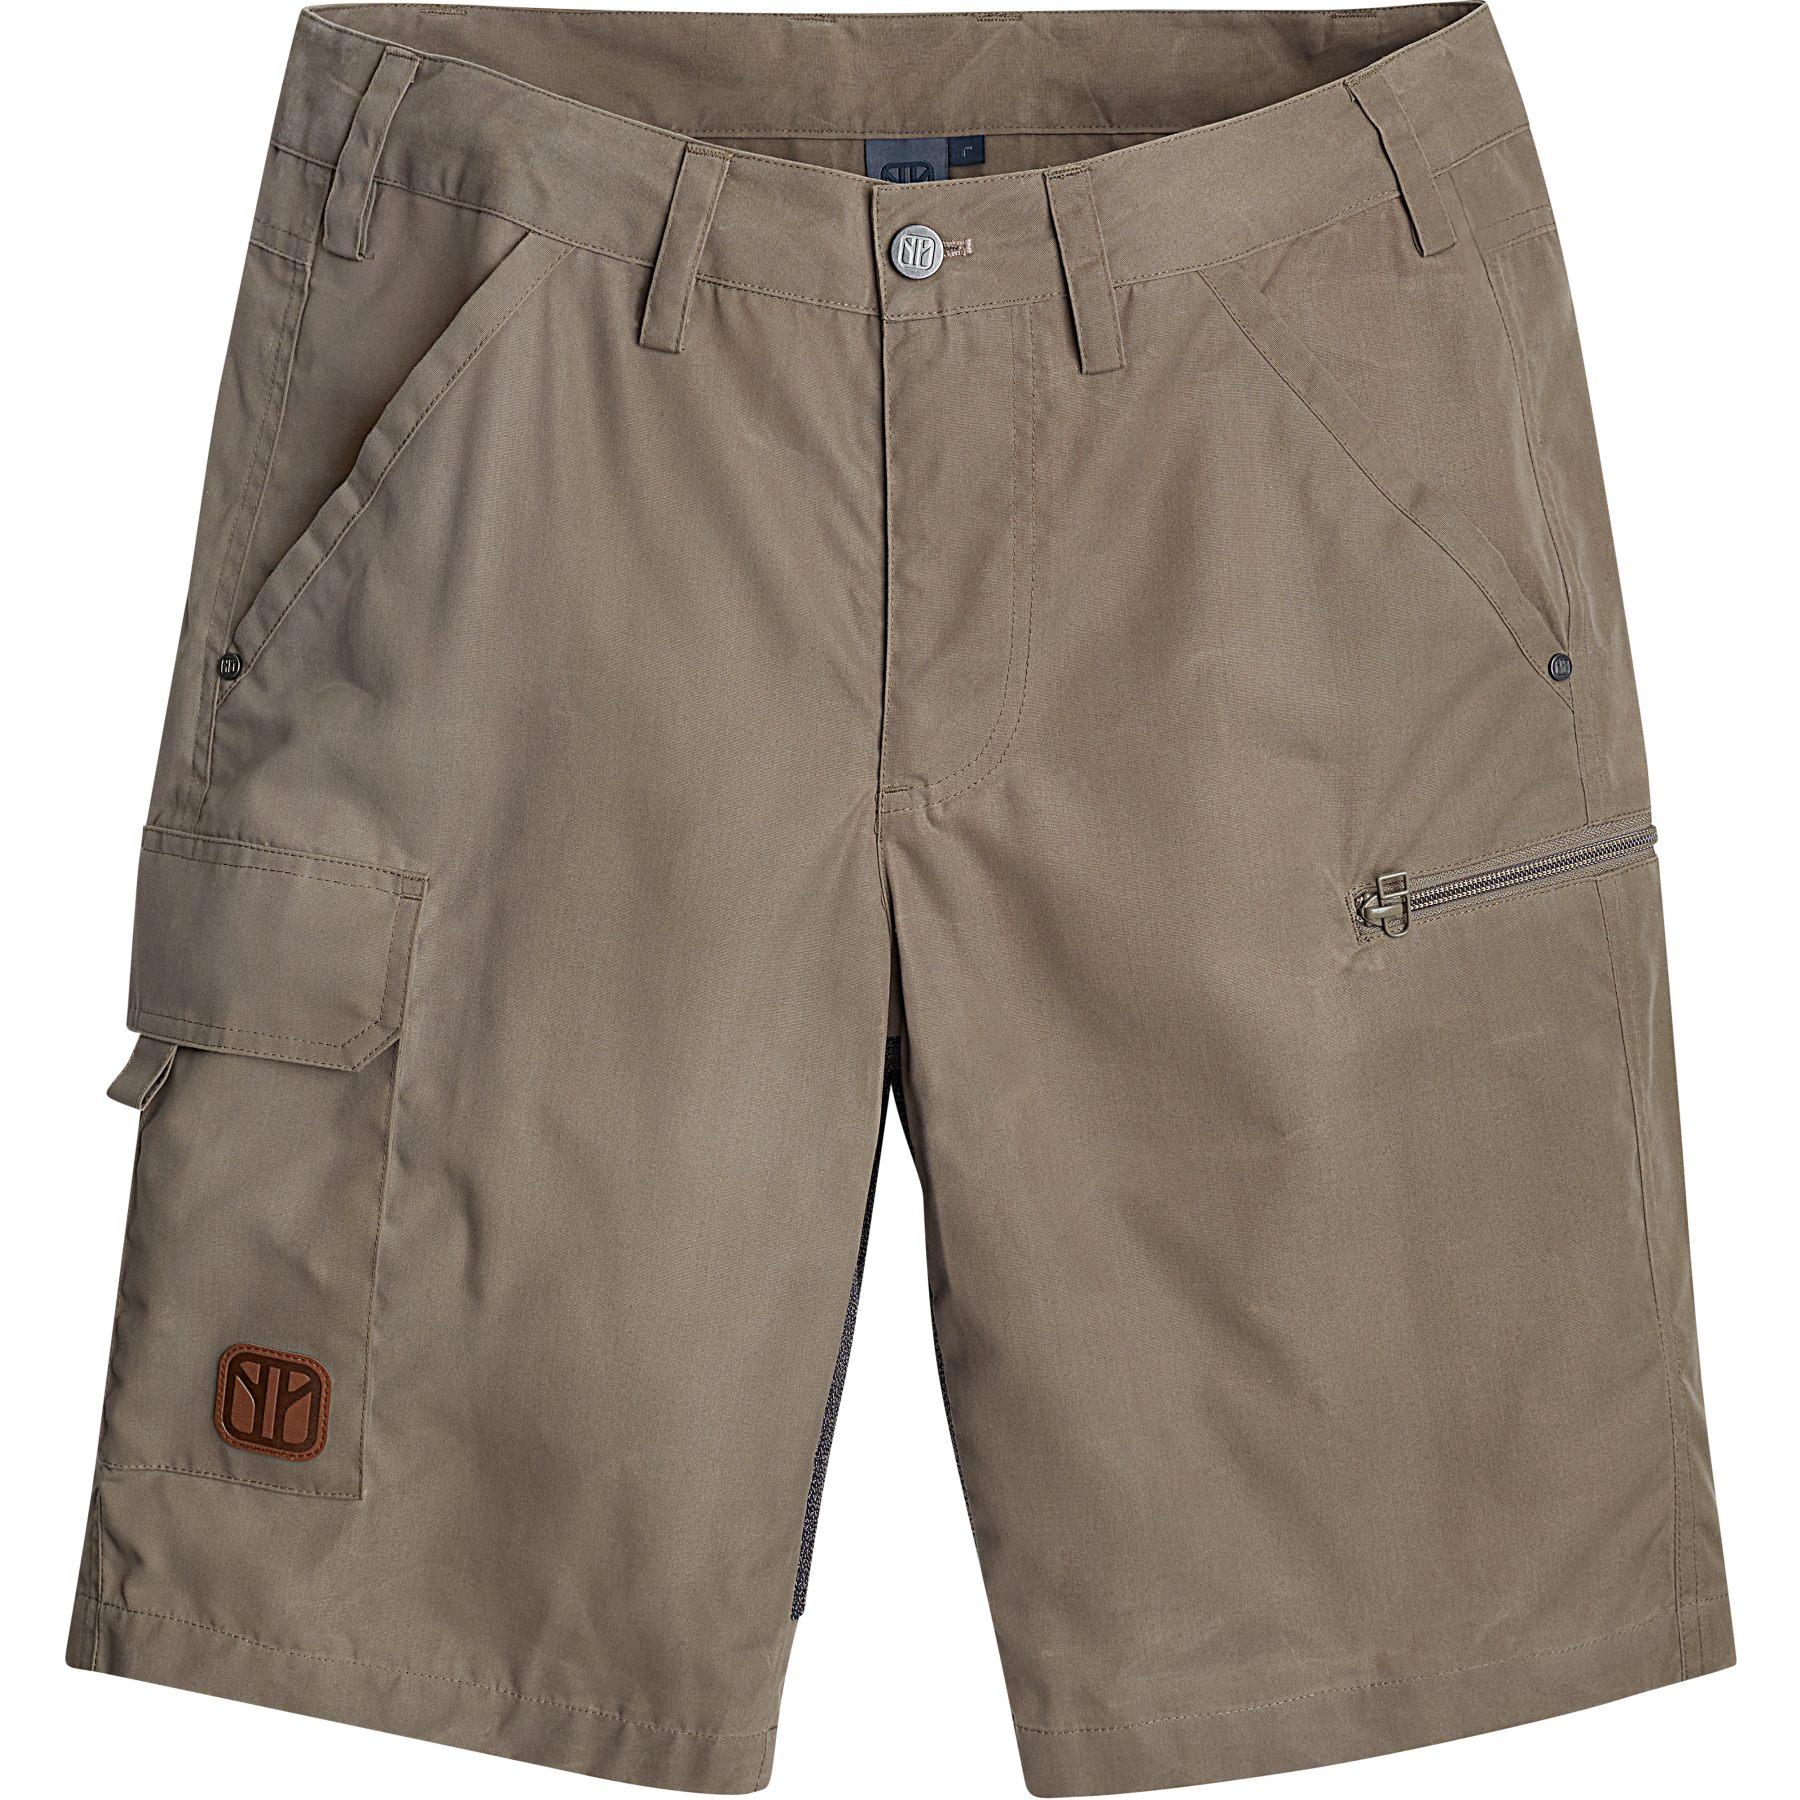 Elkline SIT UP Shorts - khaki